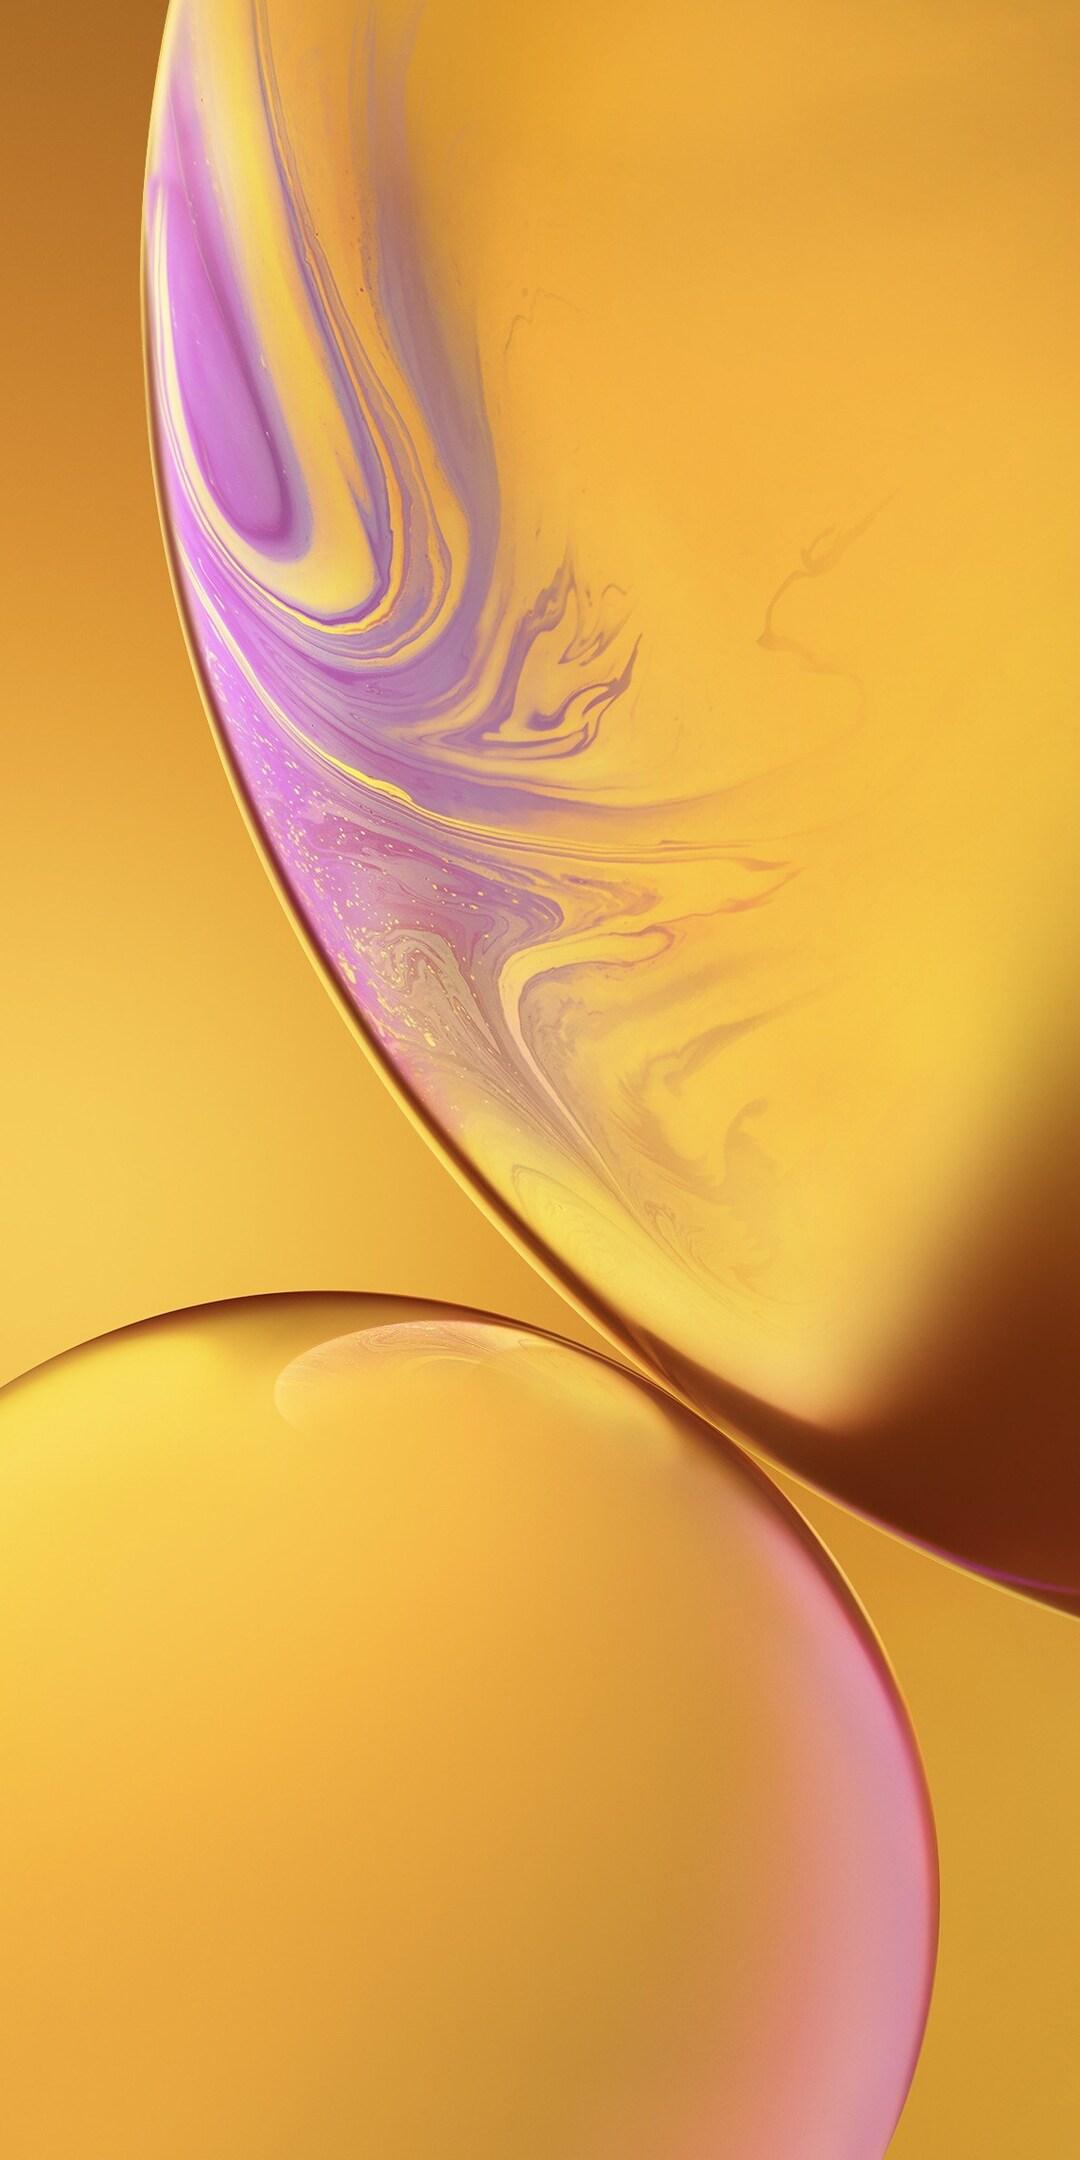 iphone-xs-double-bubble-yellow-ios-12-k5.jpg